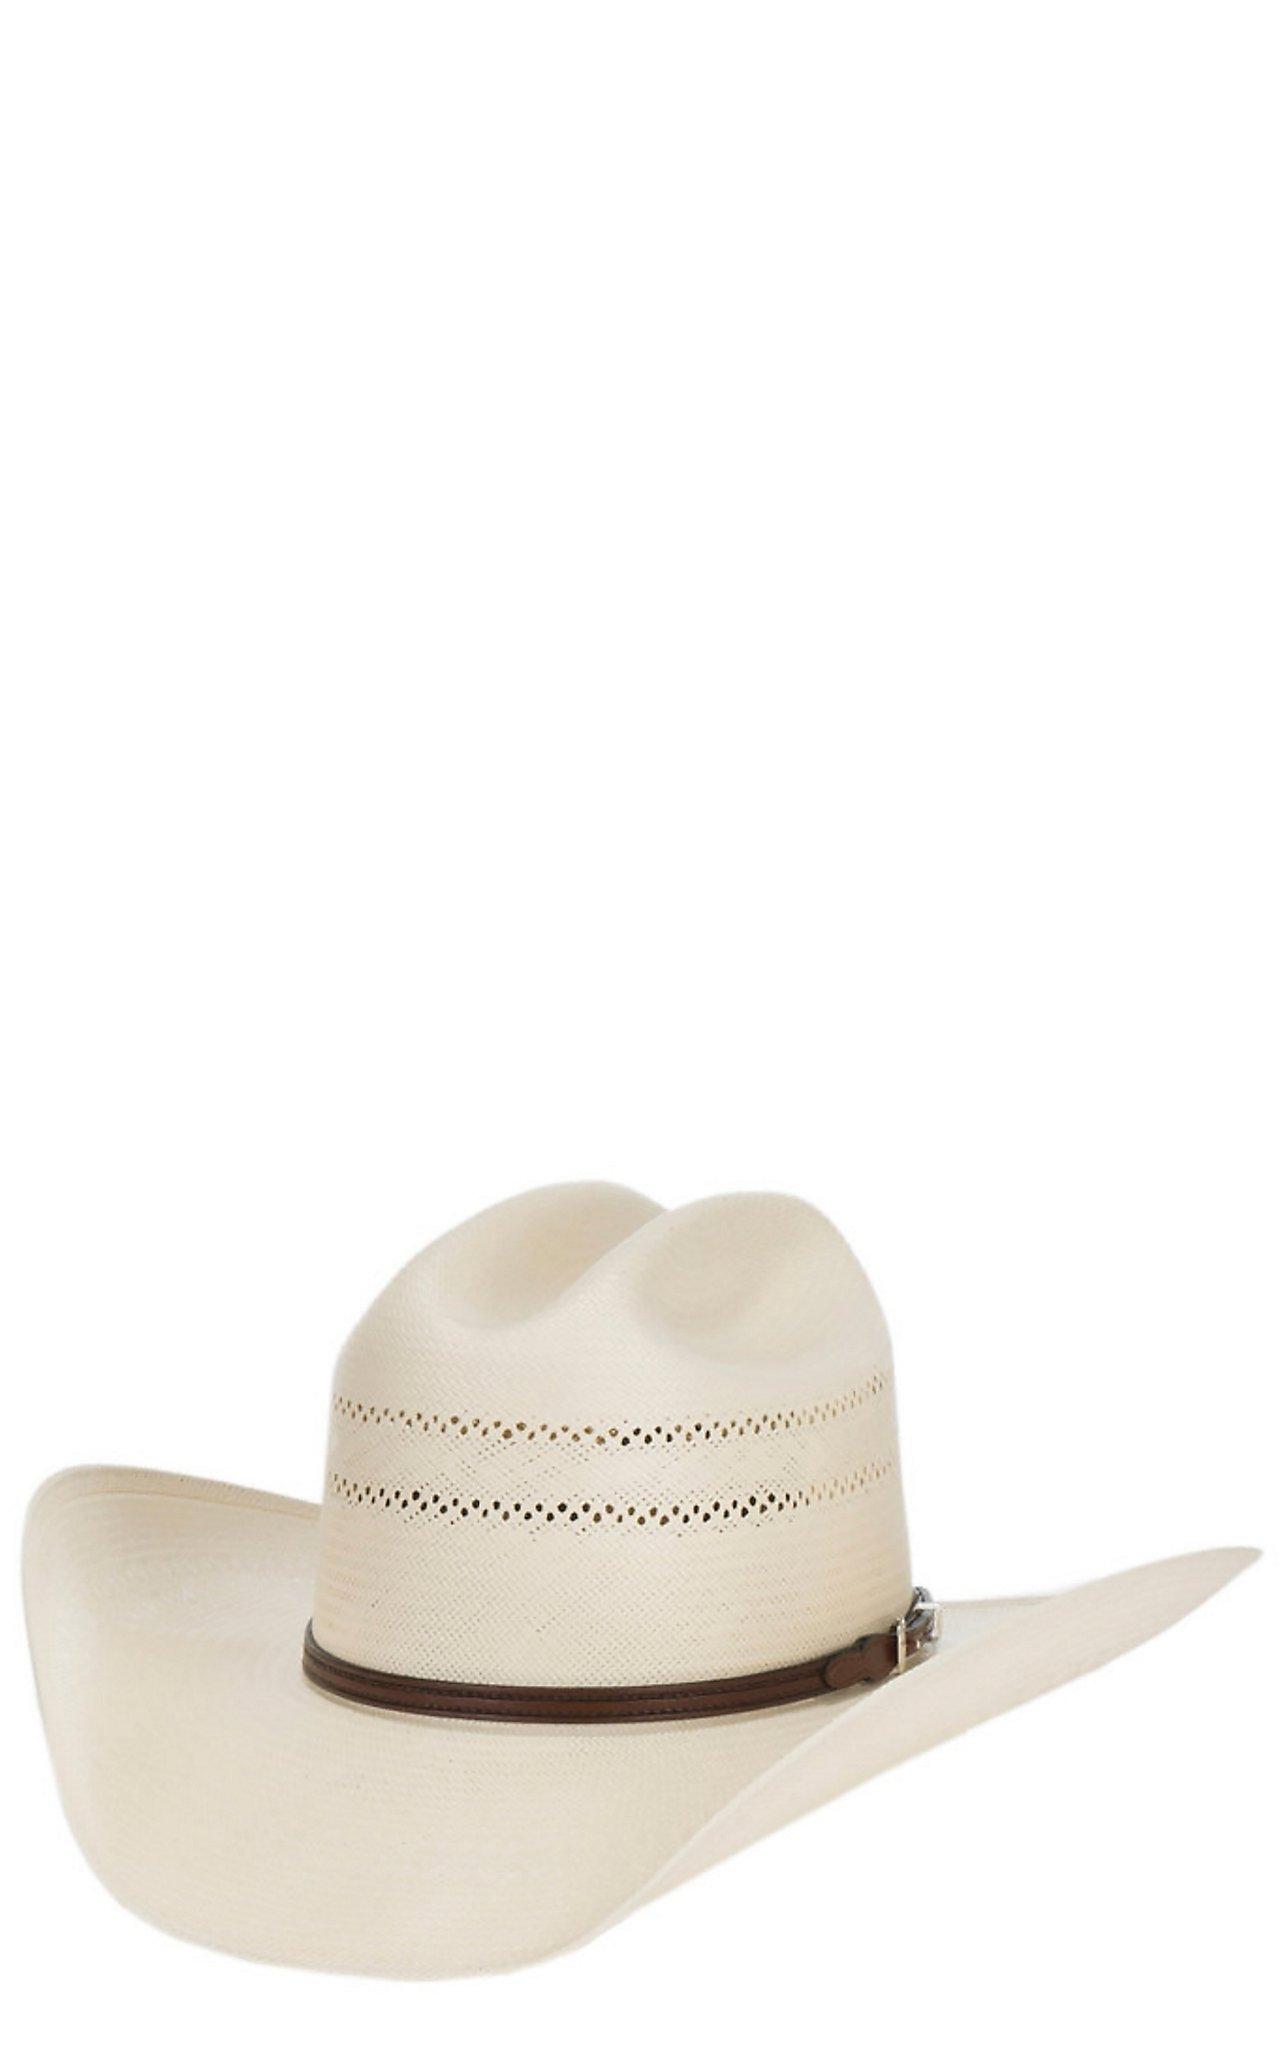 b6f13a123e1 Resistol 10X George Strait Collection Range Cattleman Crown Straw Hat